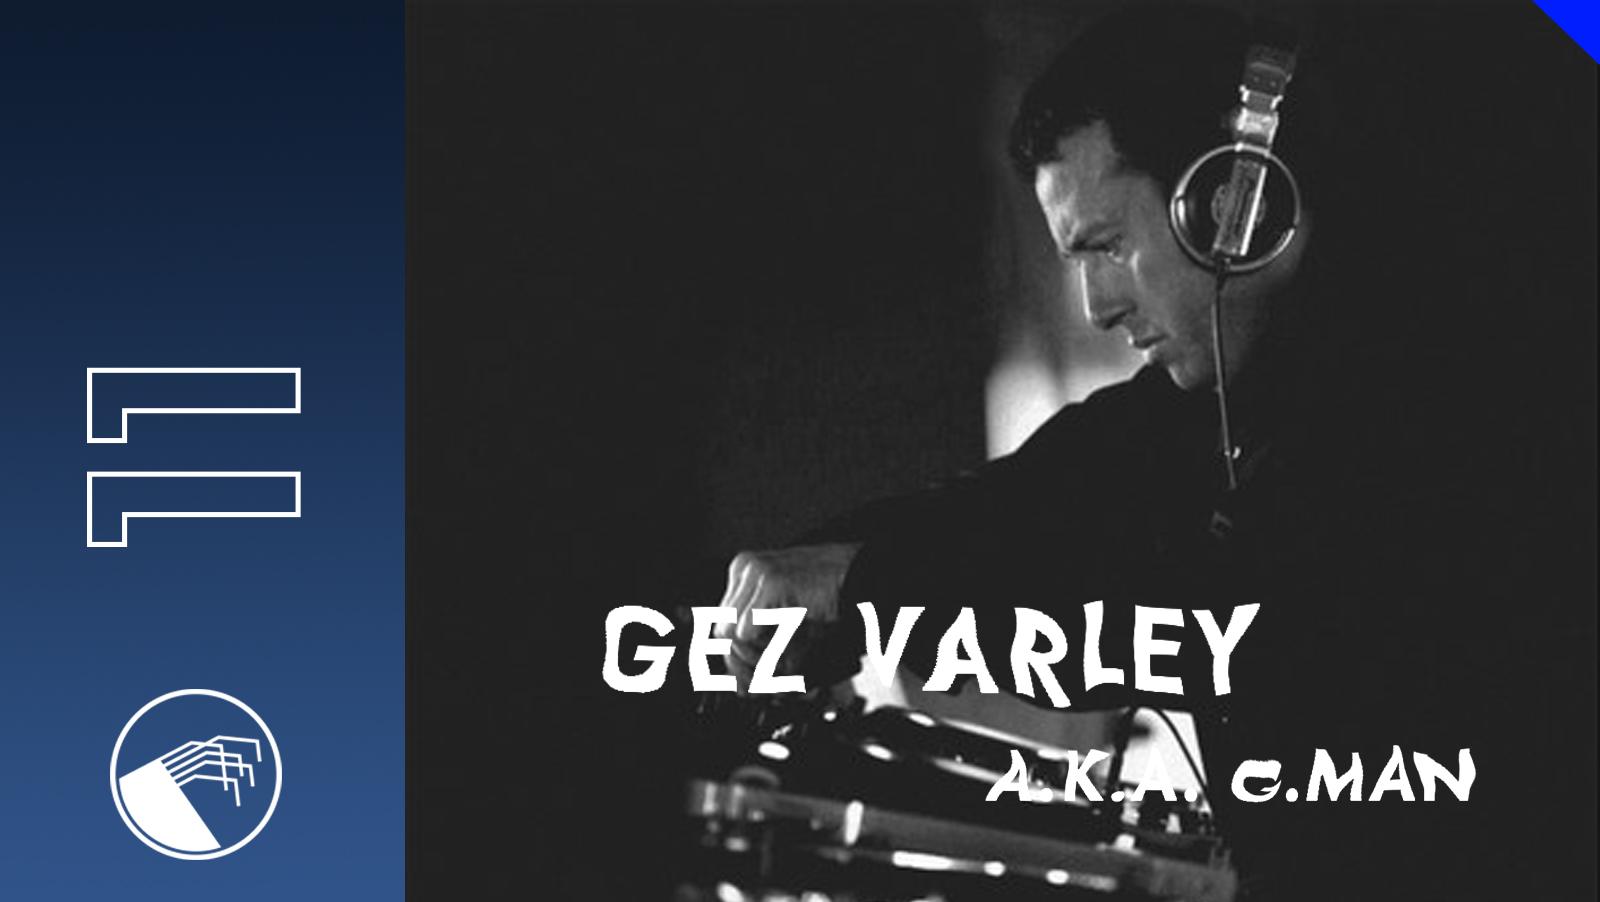 011 Gez varley aka G-Man